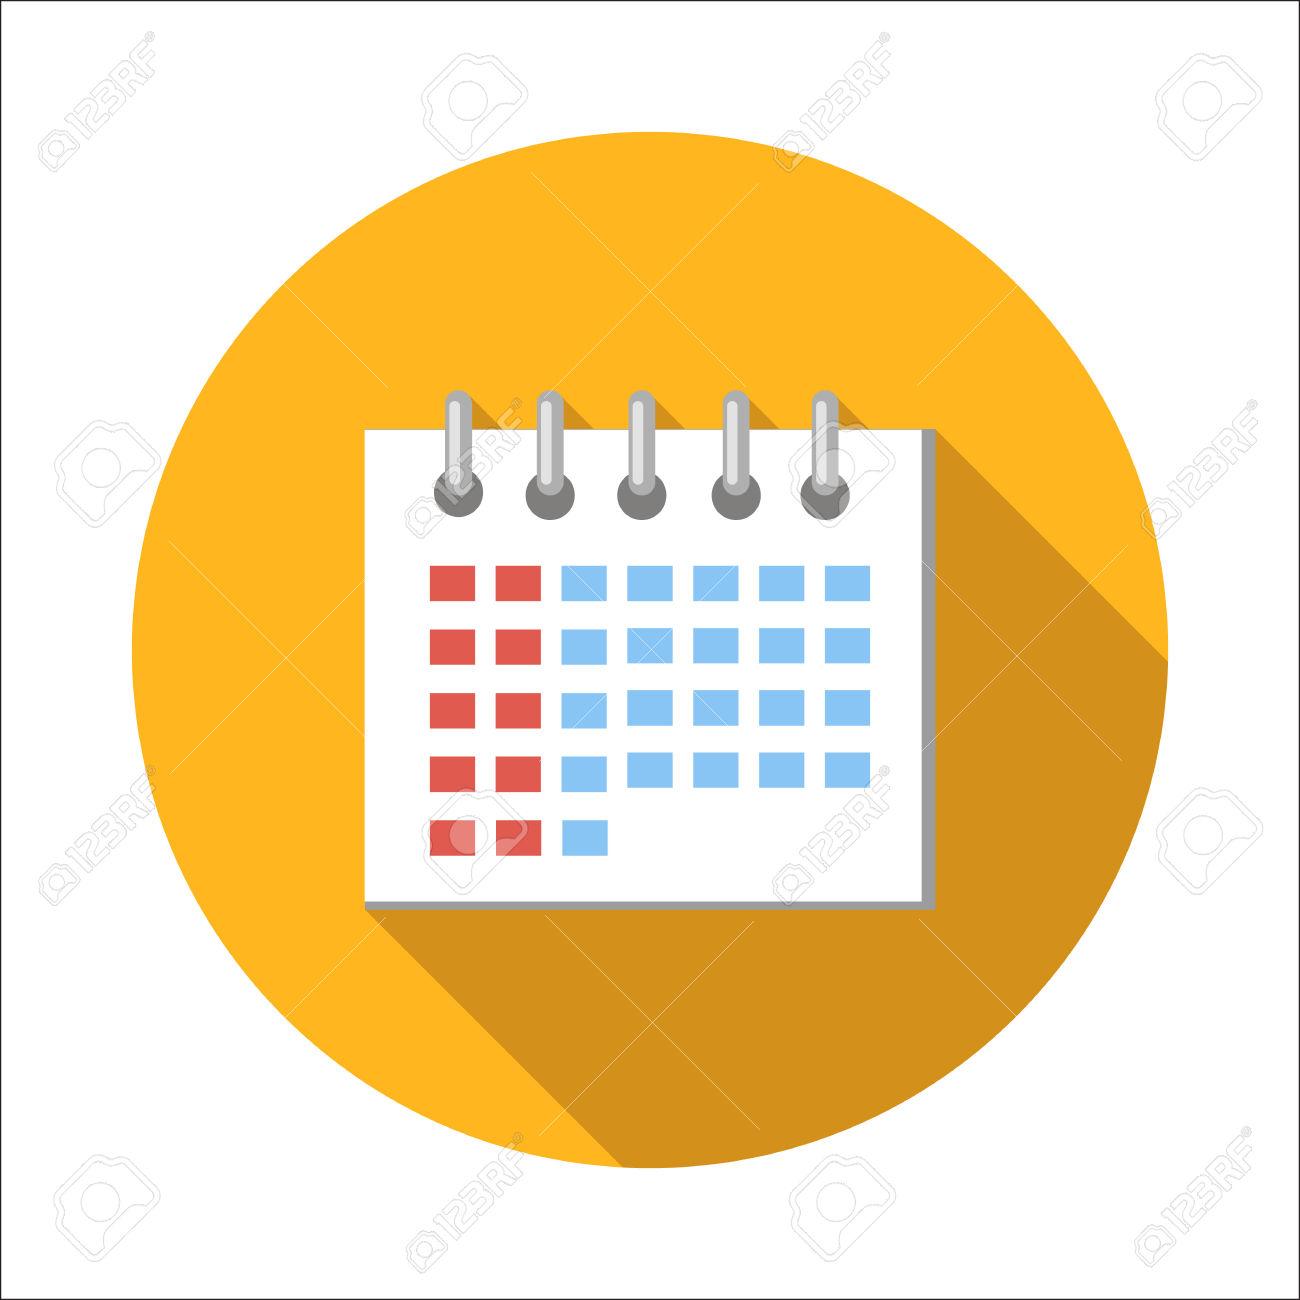 Calendar flat clipart clipground for Clipart calendario